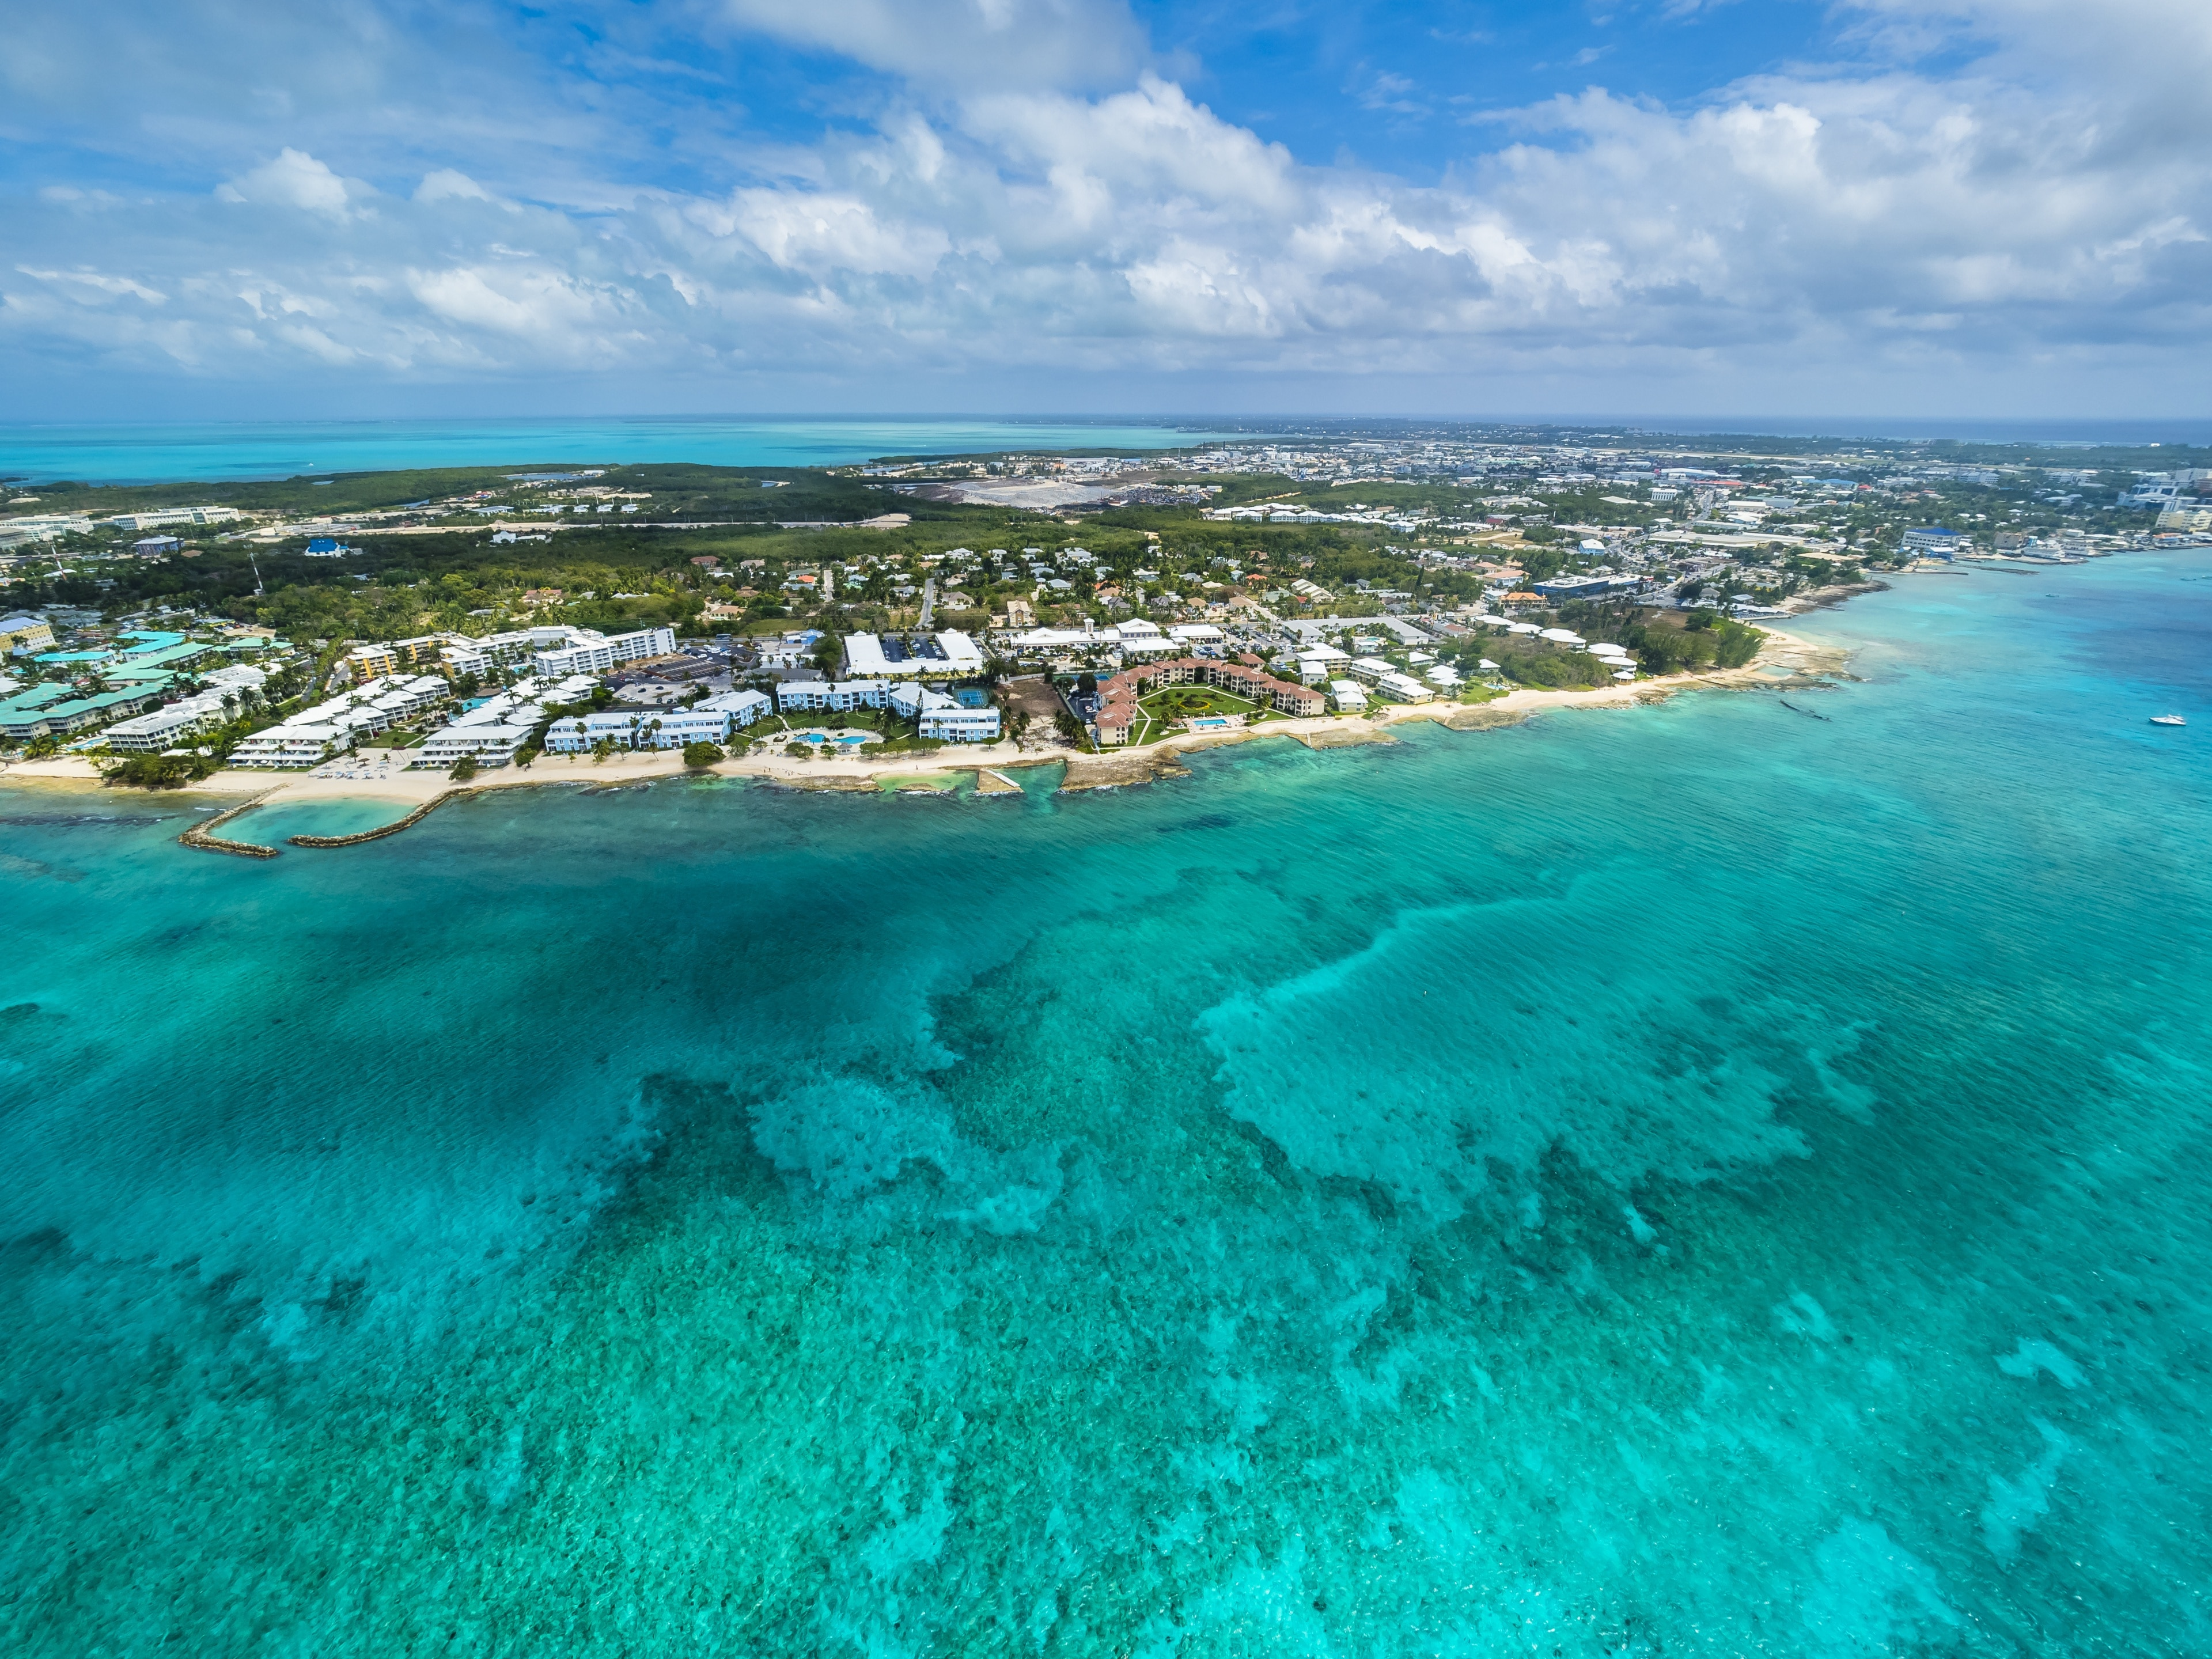 West Bay, Grand Cayman